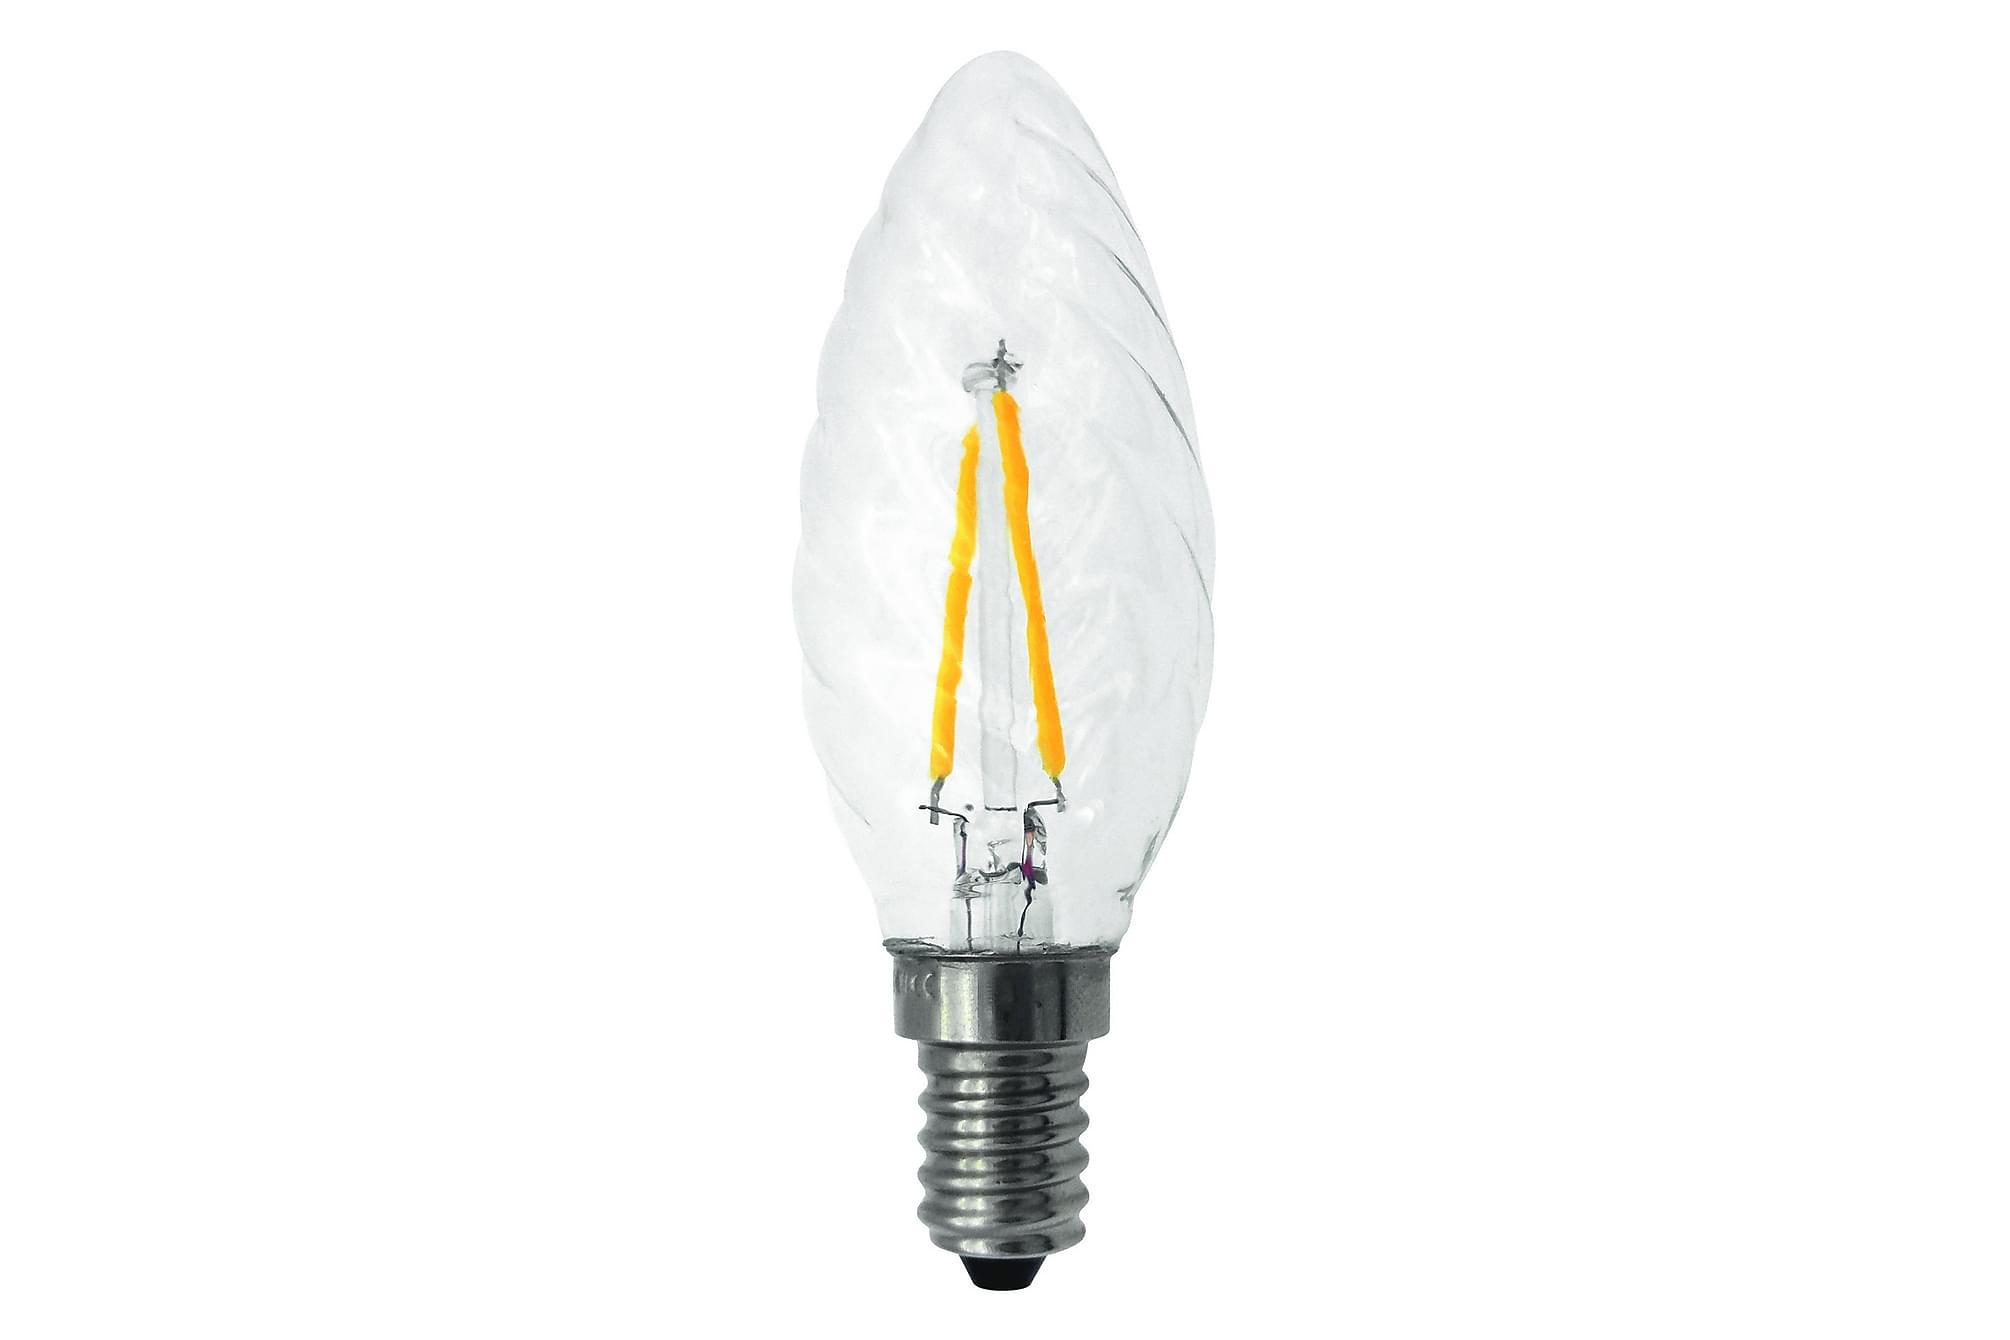 JUNG LED-lampa 3,6W E14 2700K Dim Filament, Glödlampor & ljuskällor